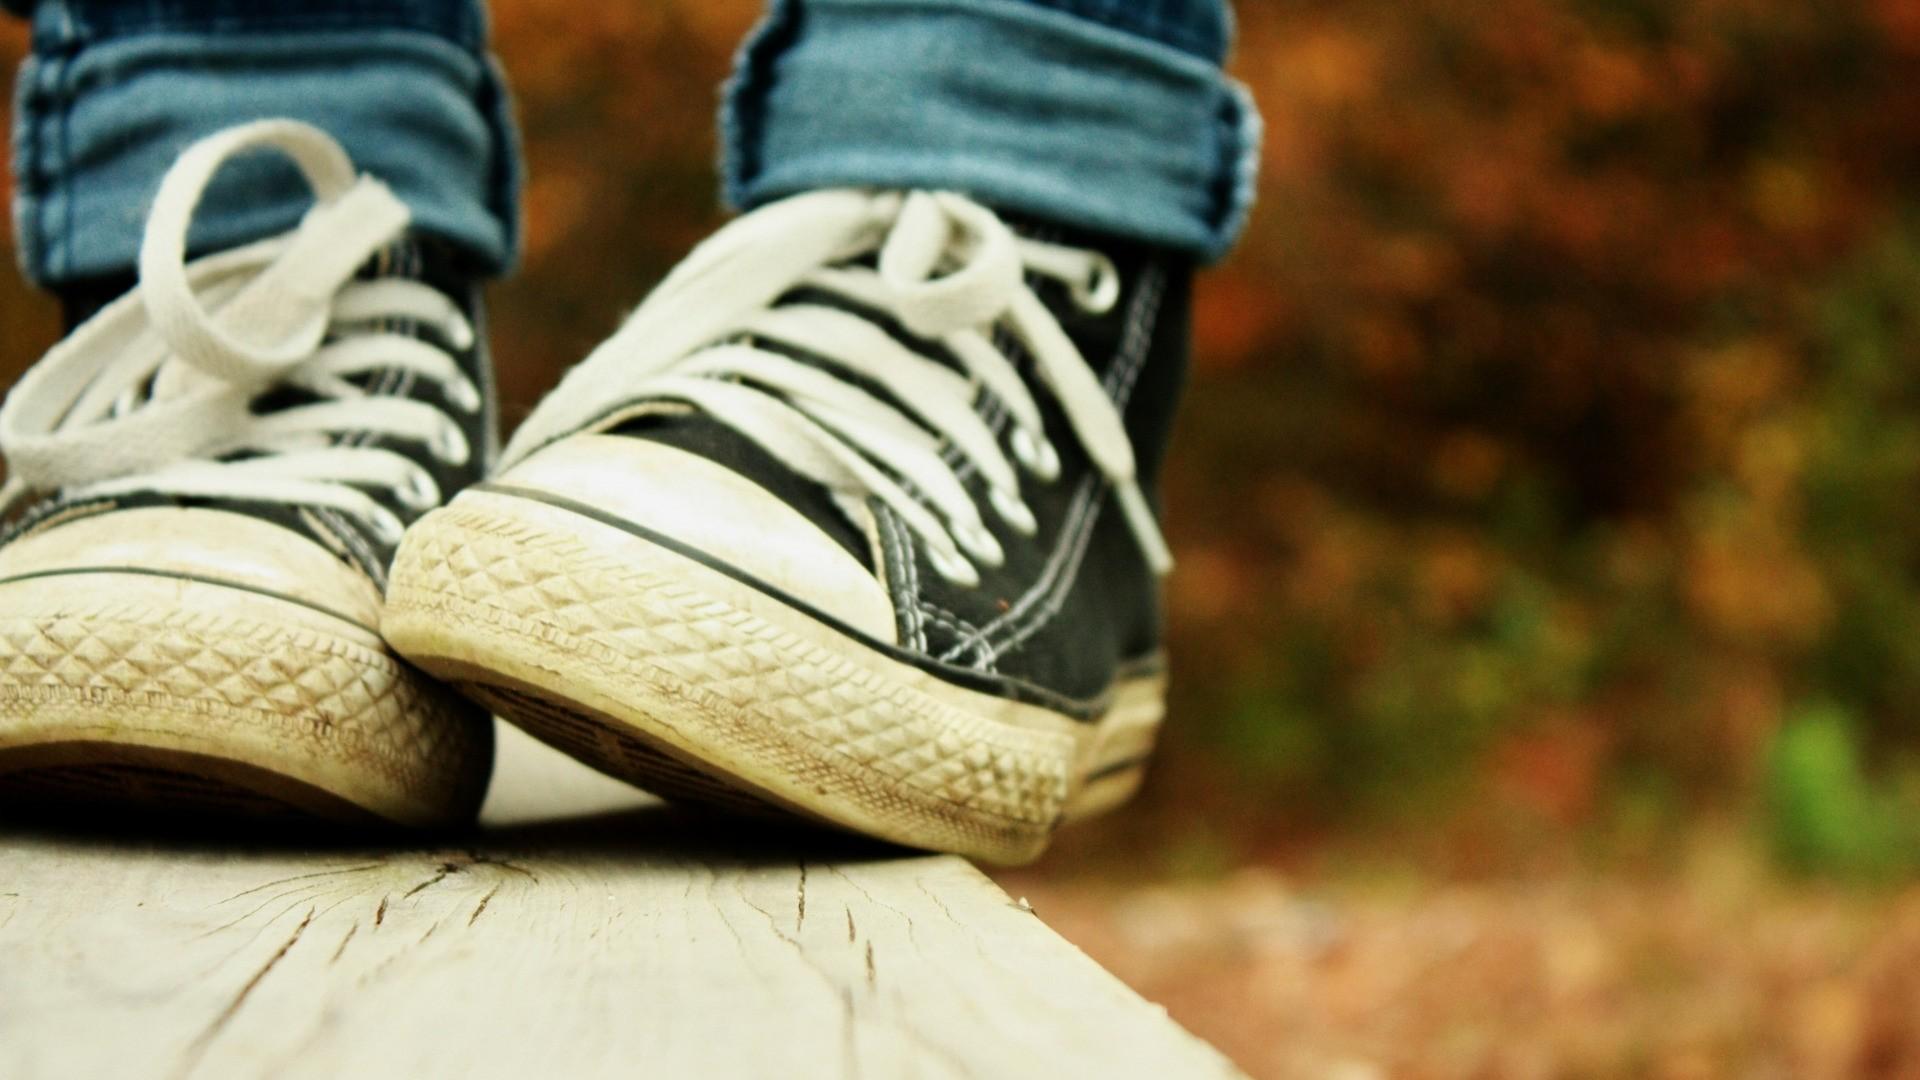 Shoes hd desktop wallpaper